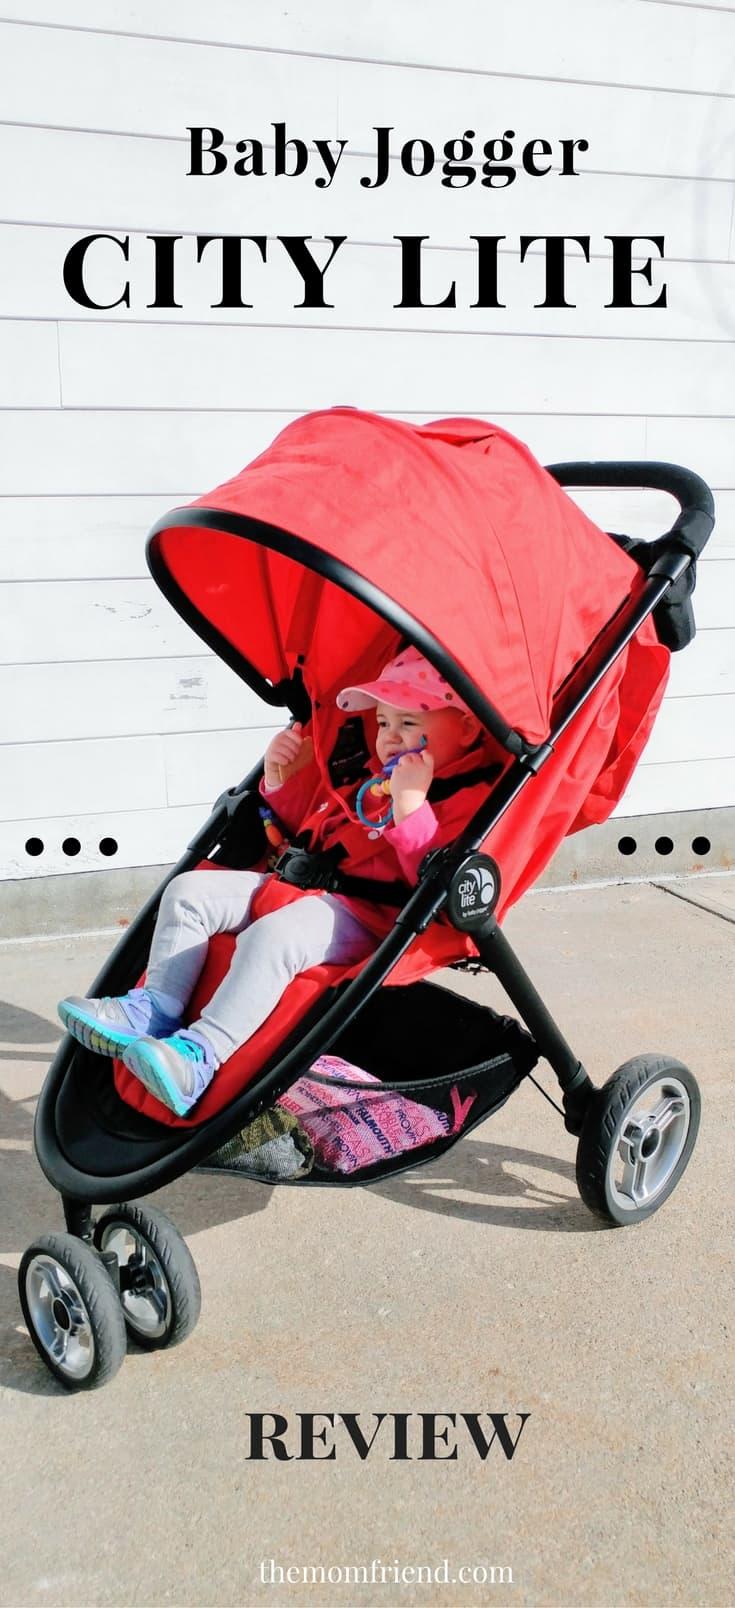 Toddler girl in red jogging stroller.